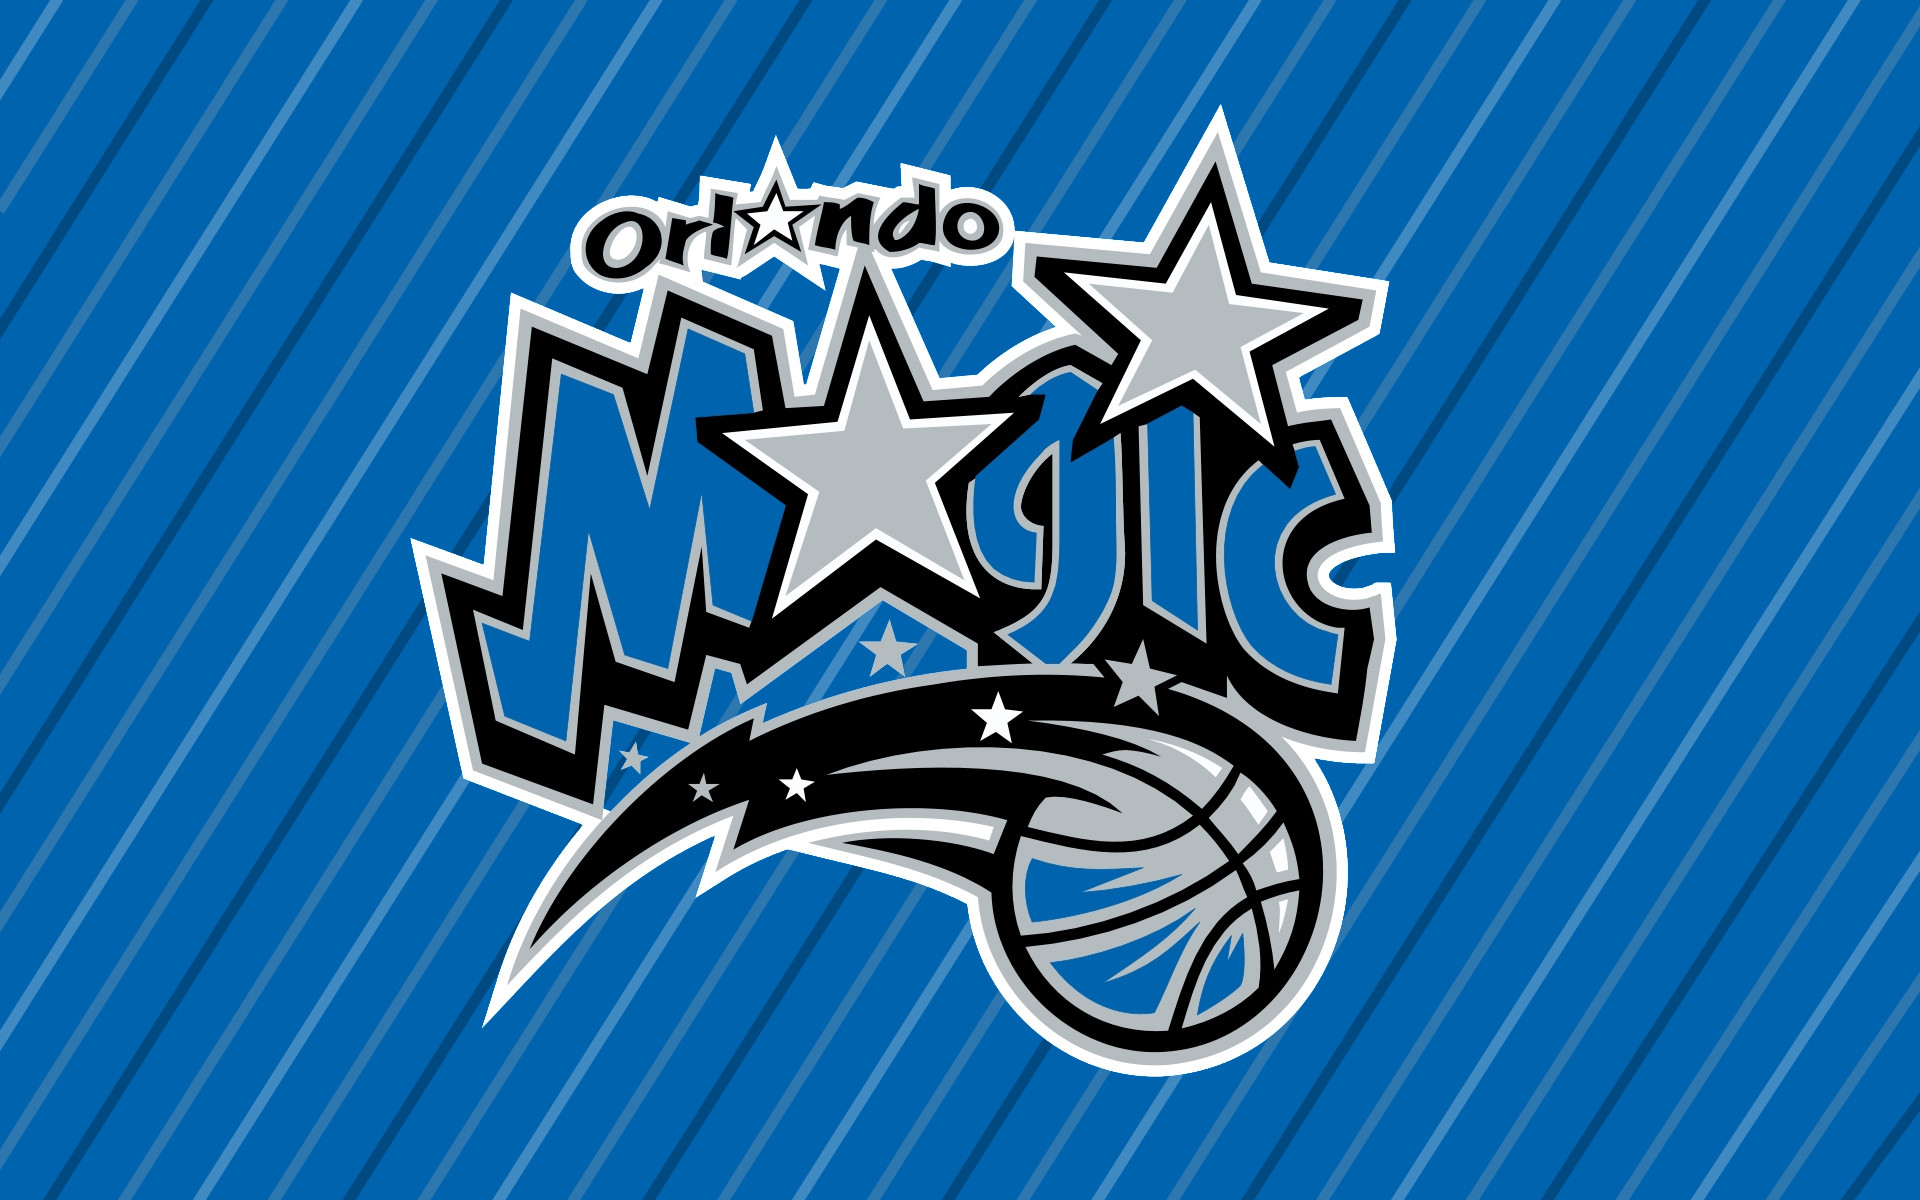 Orlando Magic Wallpaper 75 images